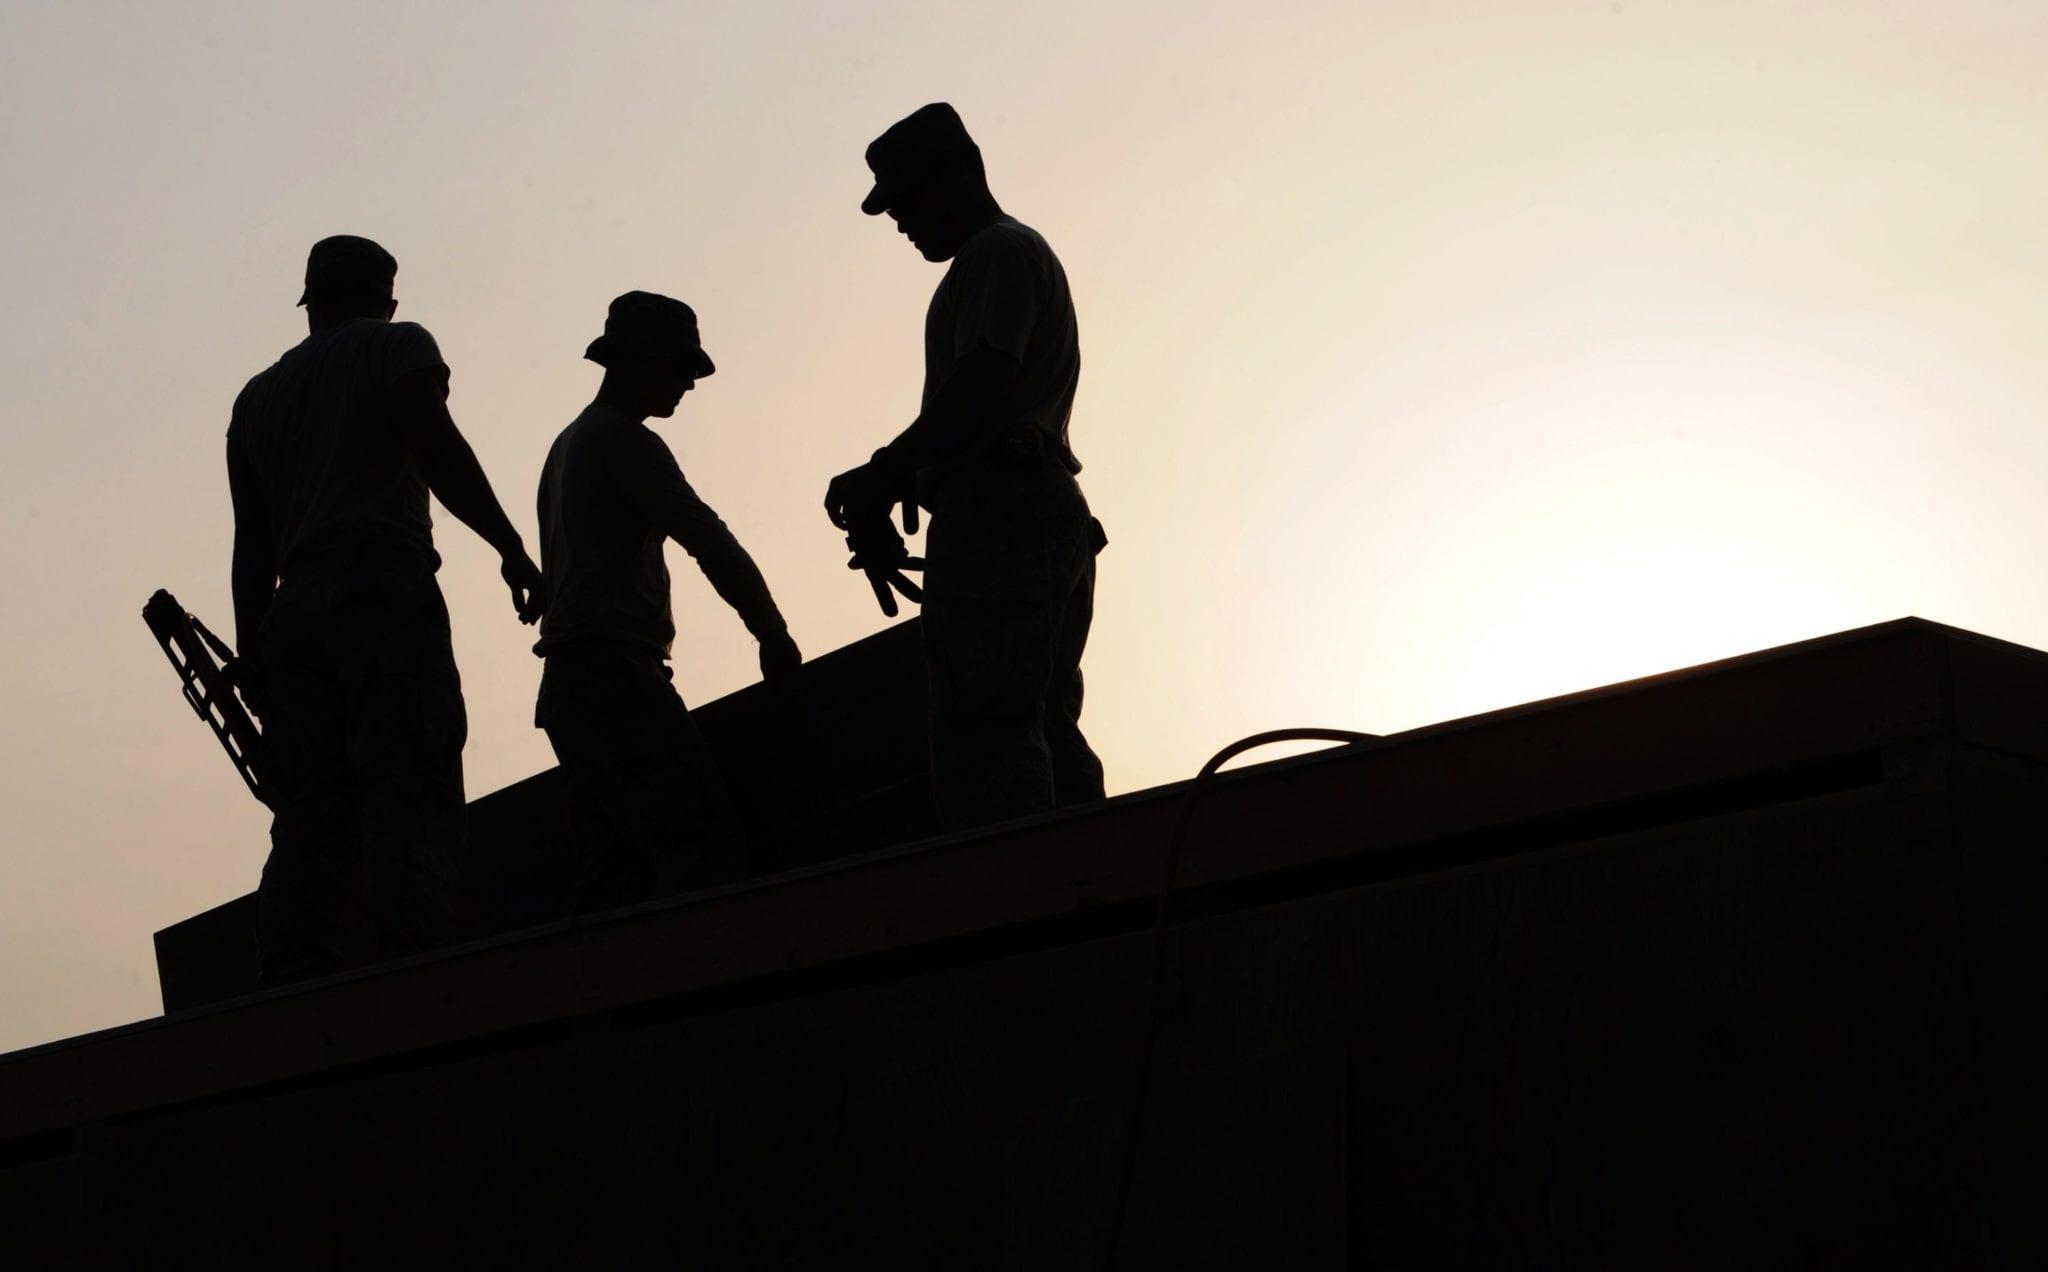 black-and-white-construction-job-38293